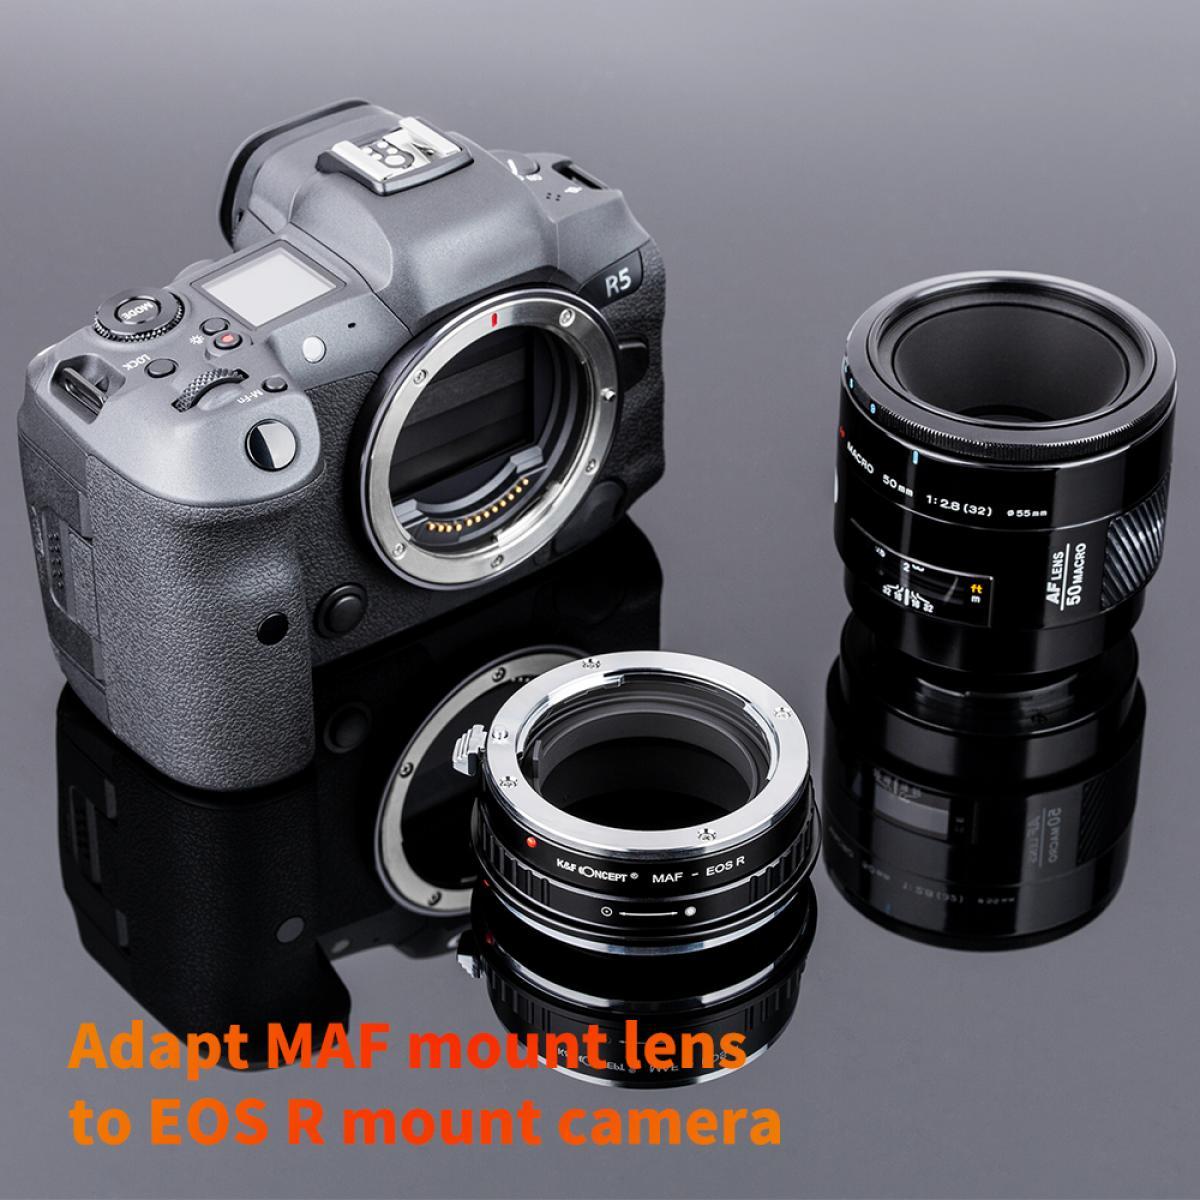 Adapter für Sony A Objektiv auf Canon EOS R Mount Kamera